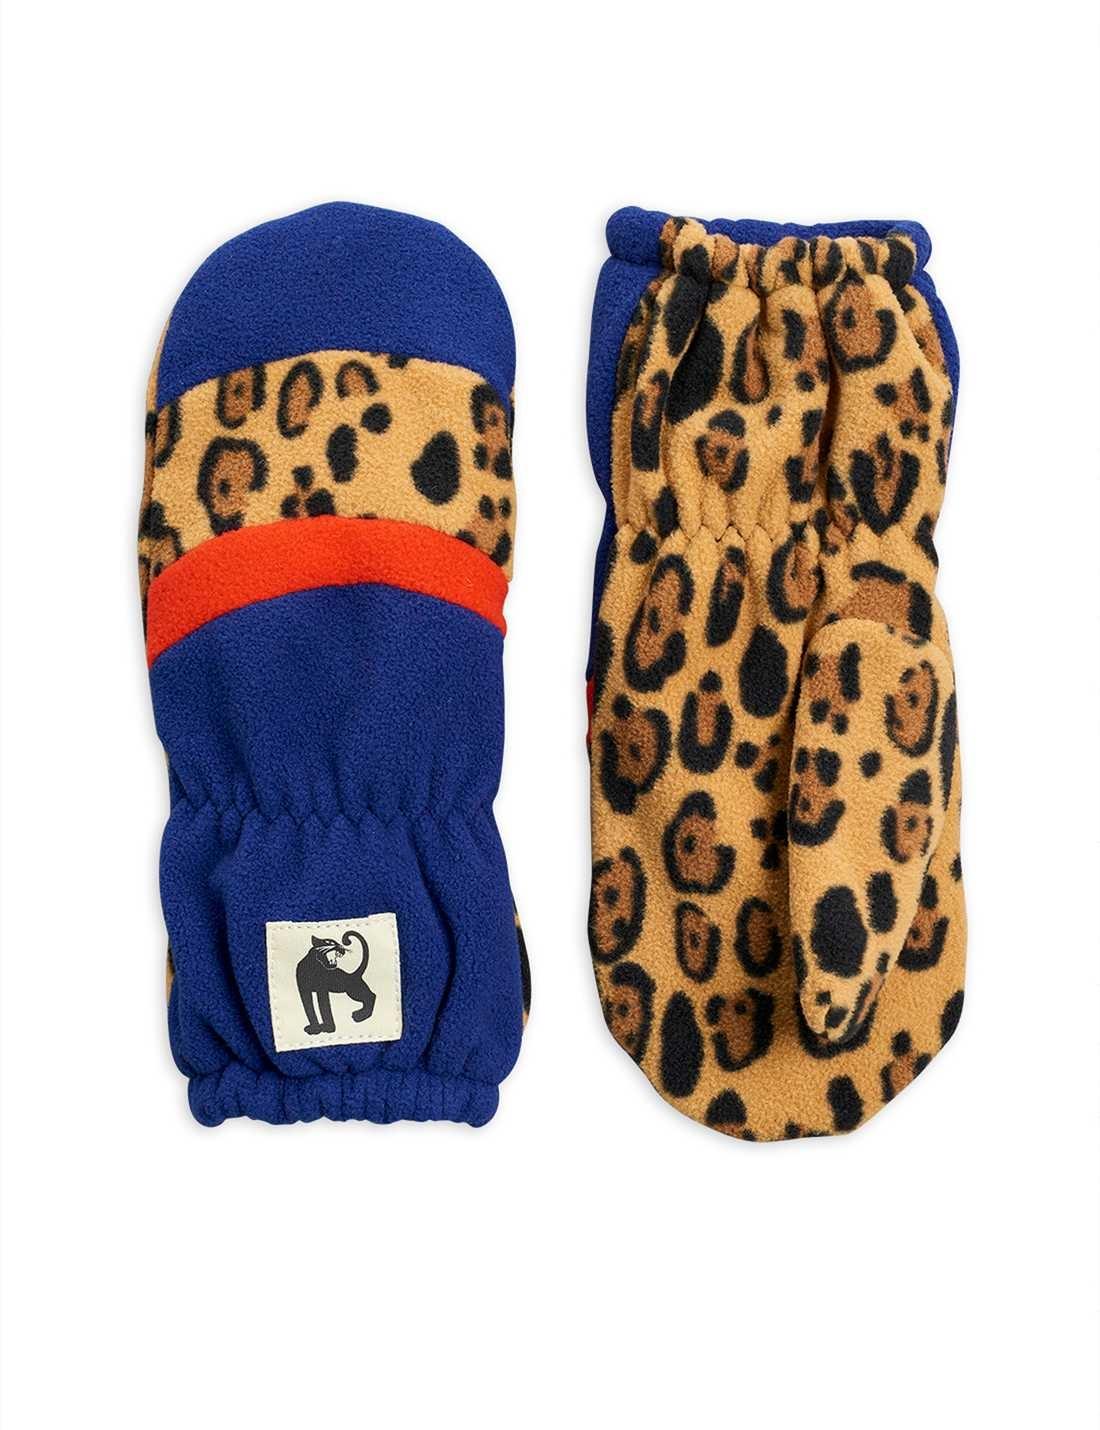 Fleece mittens / glove stripe - Blue-1